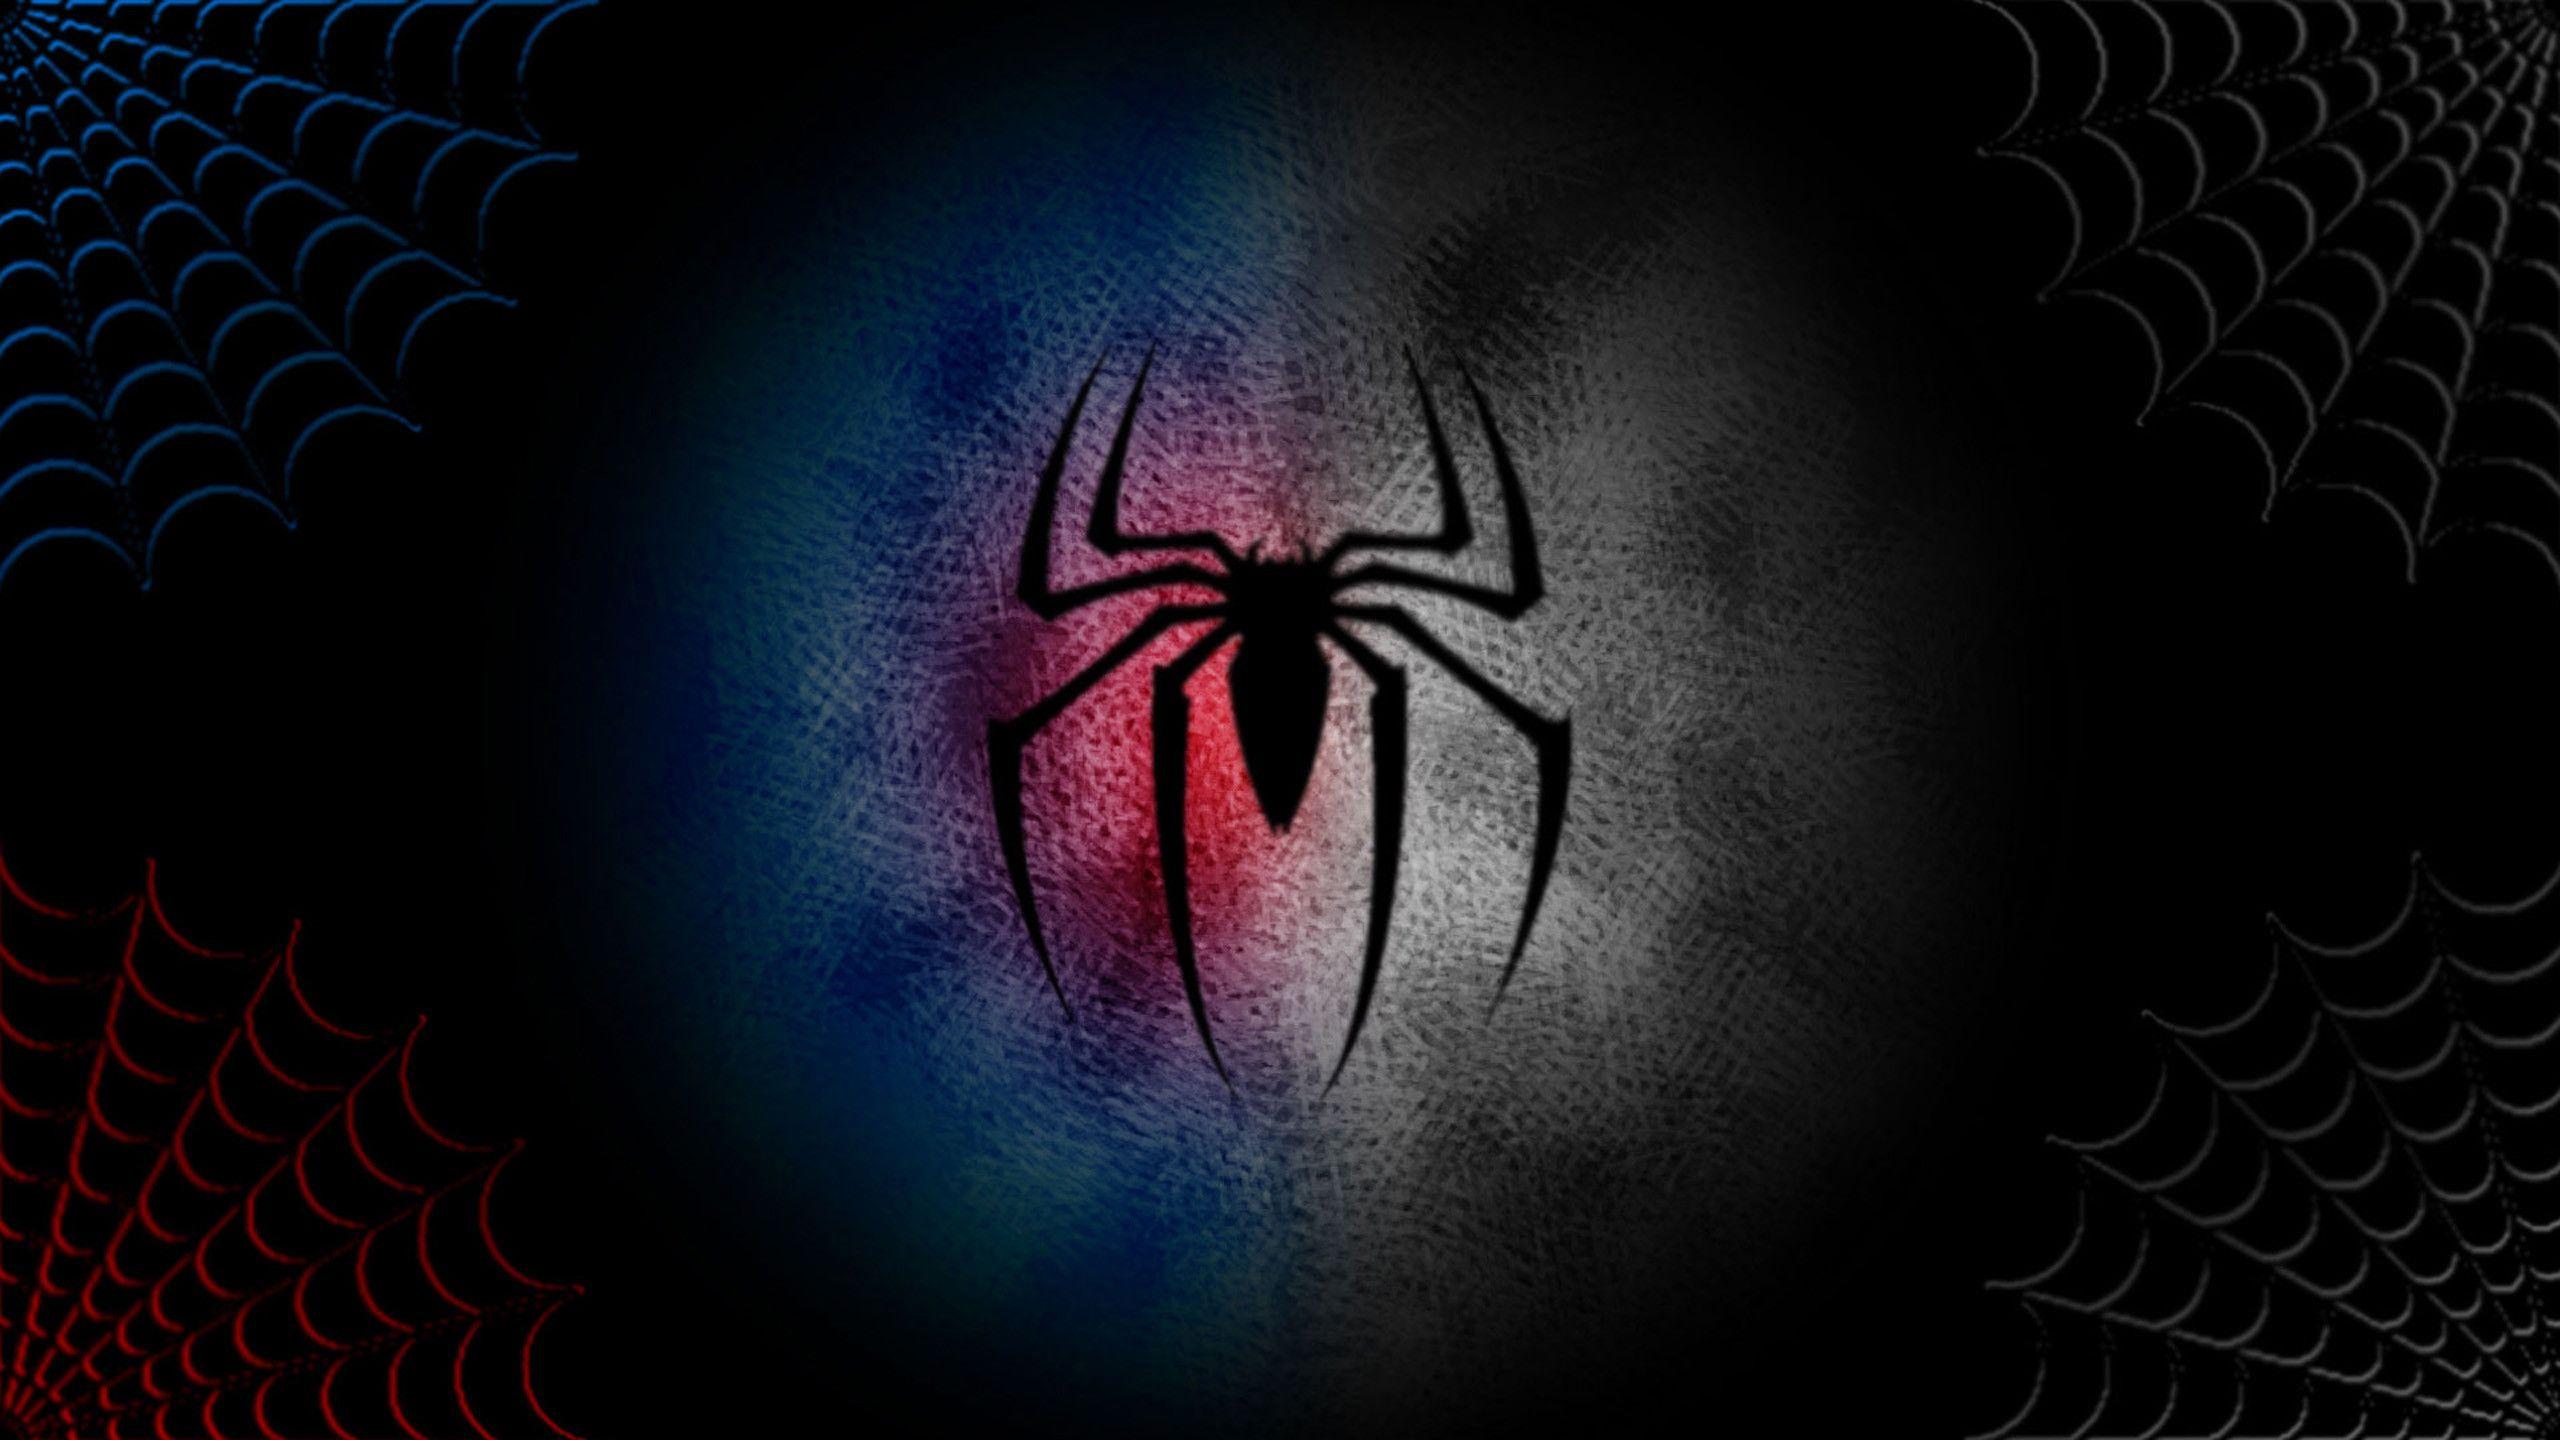 2560x1440 Spiderman Logo Wallpaper Hd Desktop Wallpapers